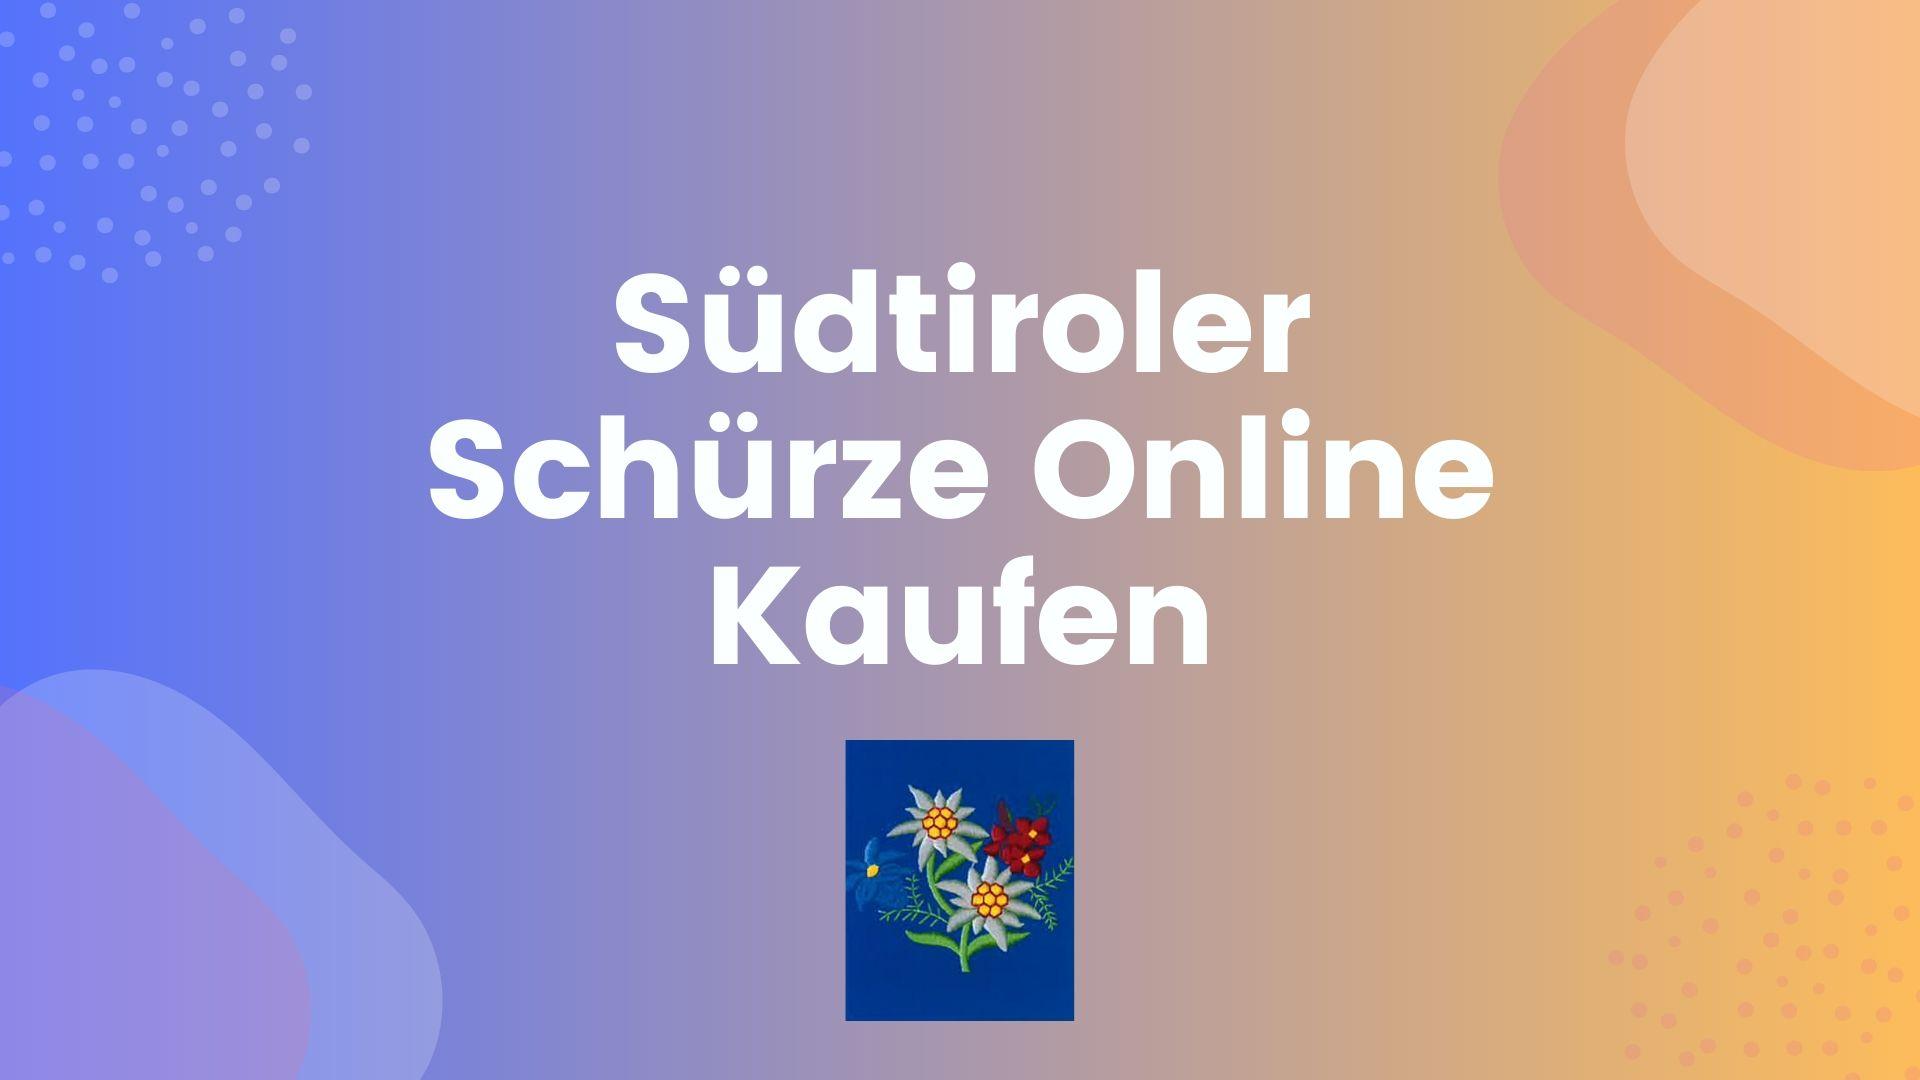 Südtiroler Schürze Online